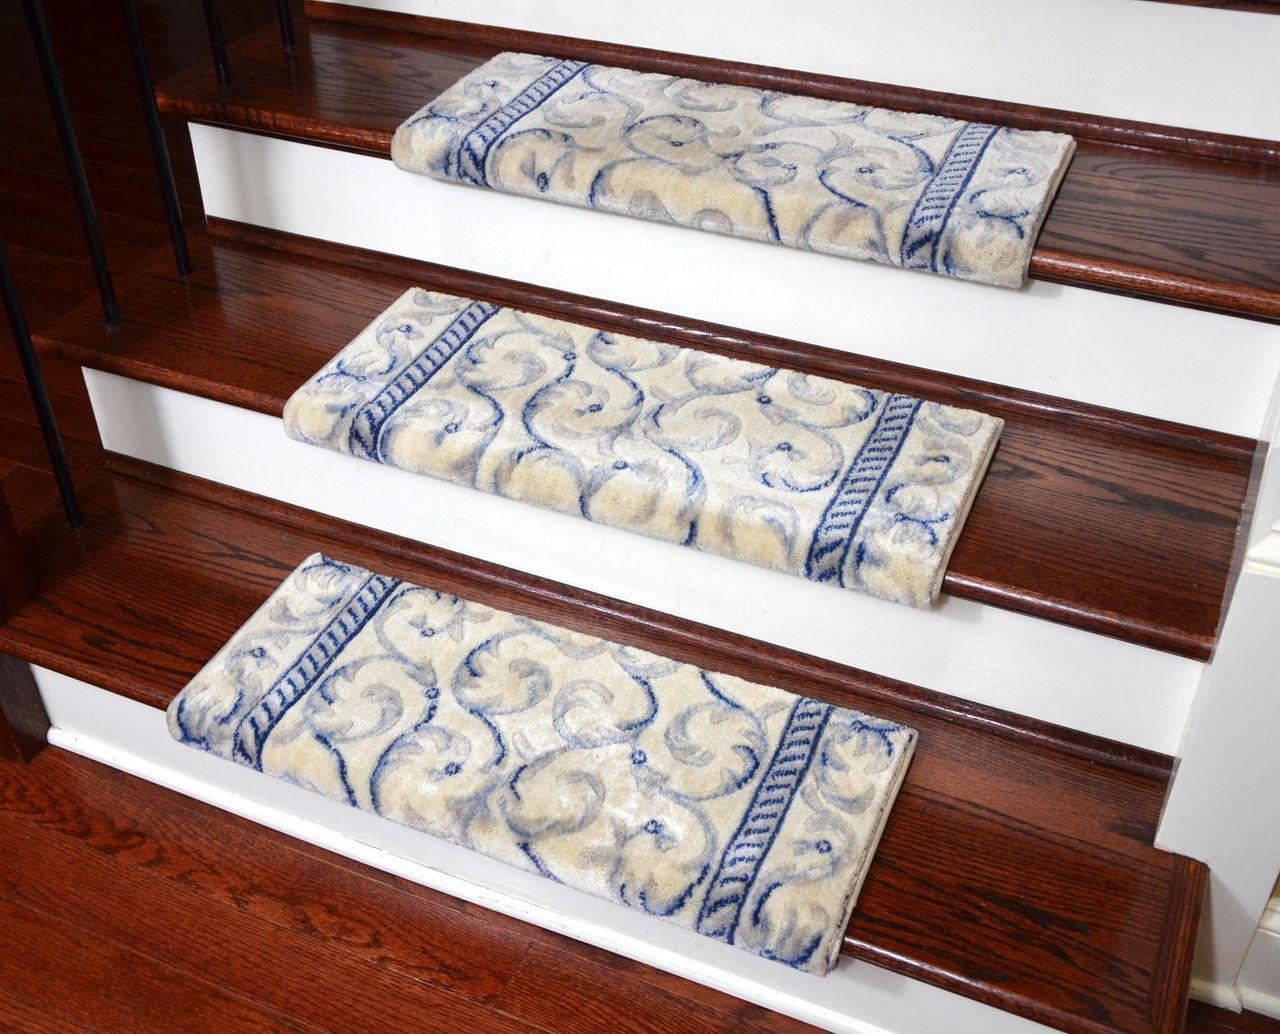 Dean Non Slip Tape Free Pet Friendly Stair Gripper Bullnose Carpet   Dean Non Slip Stair Treads   Friendly Diy   Landing Mat   Fiber Sisal   Rugs   Keshan Chocolate